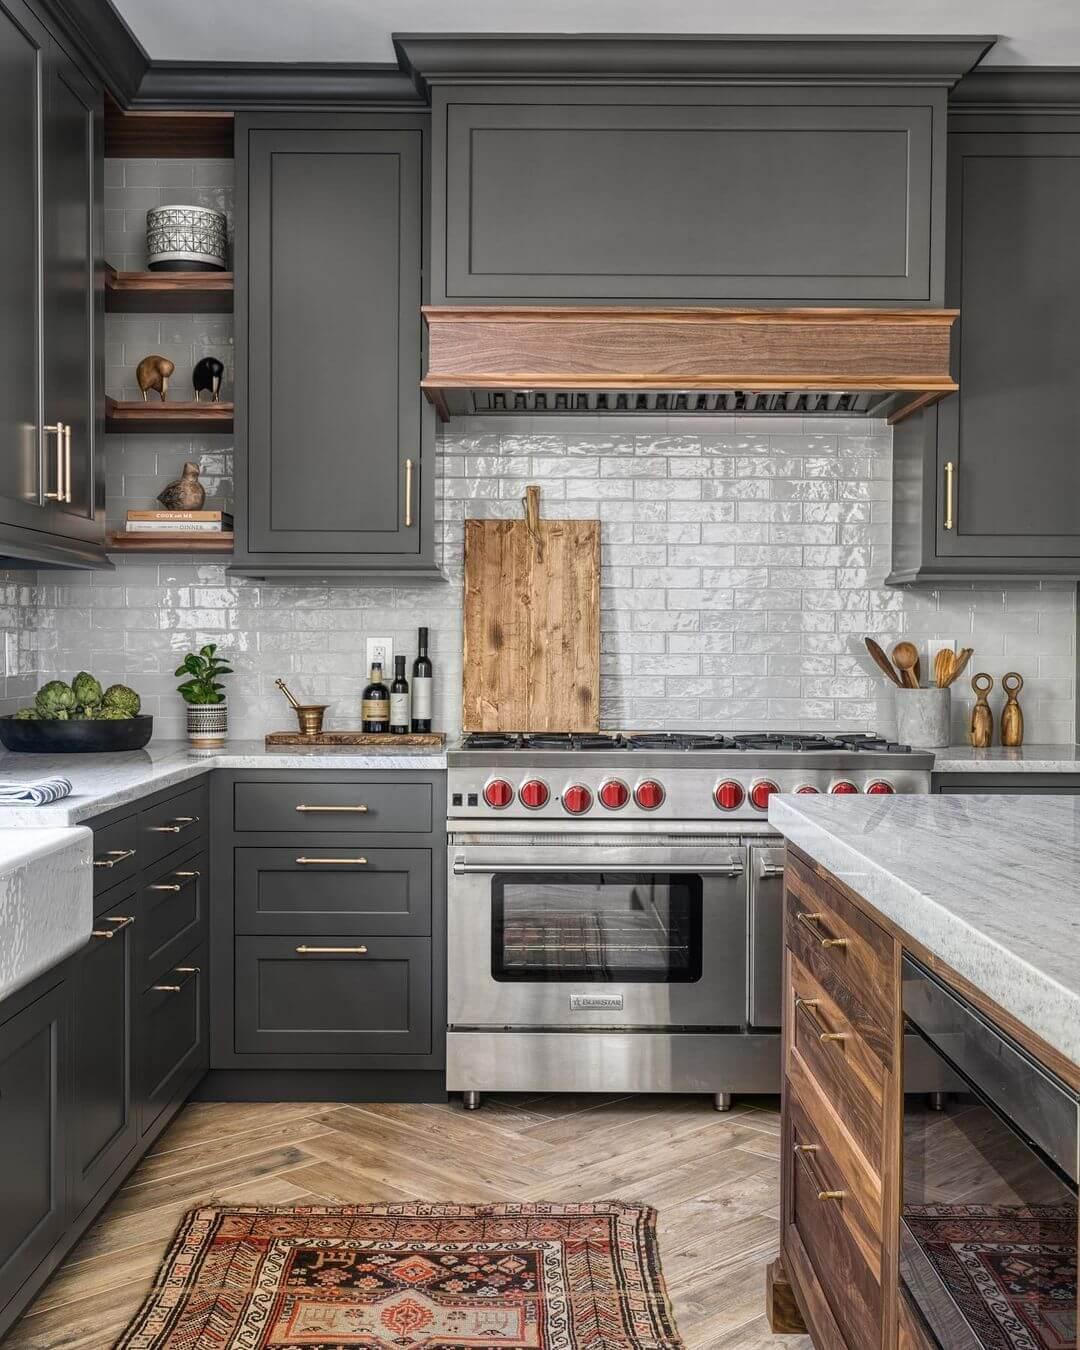 Is Quartz or Granite Better for Kitchen Countertops